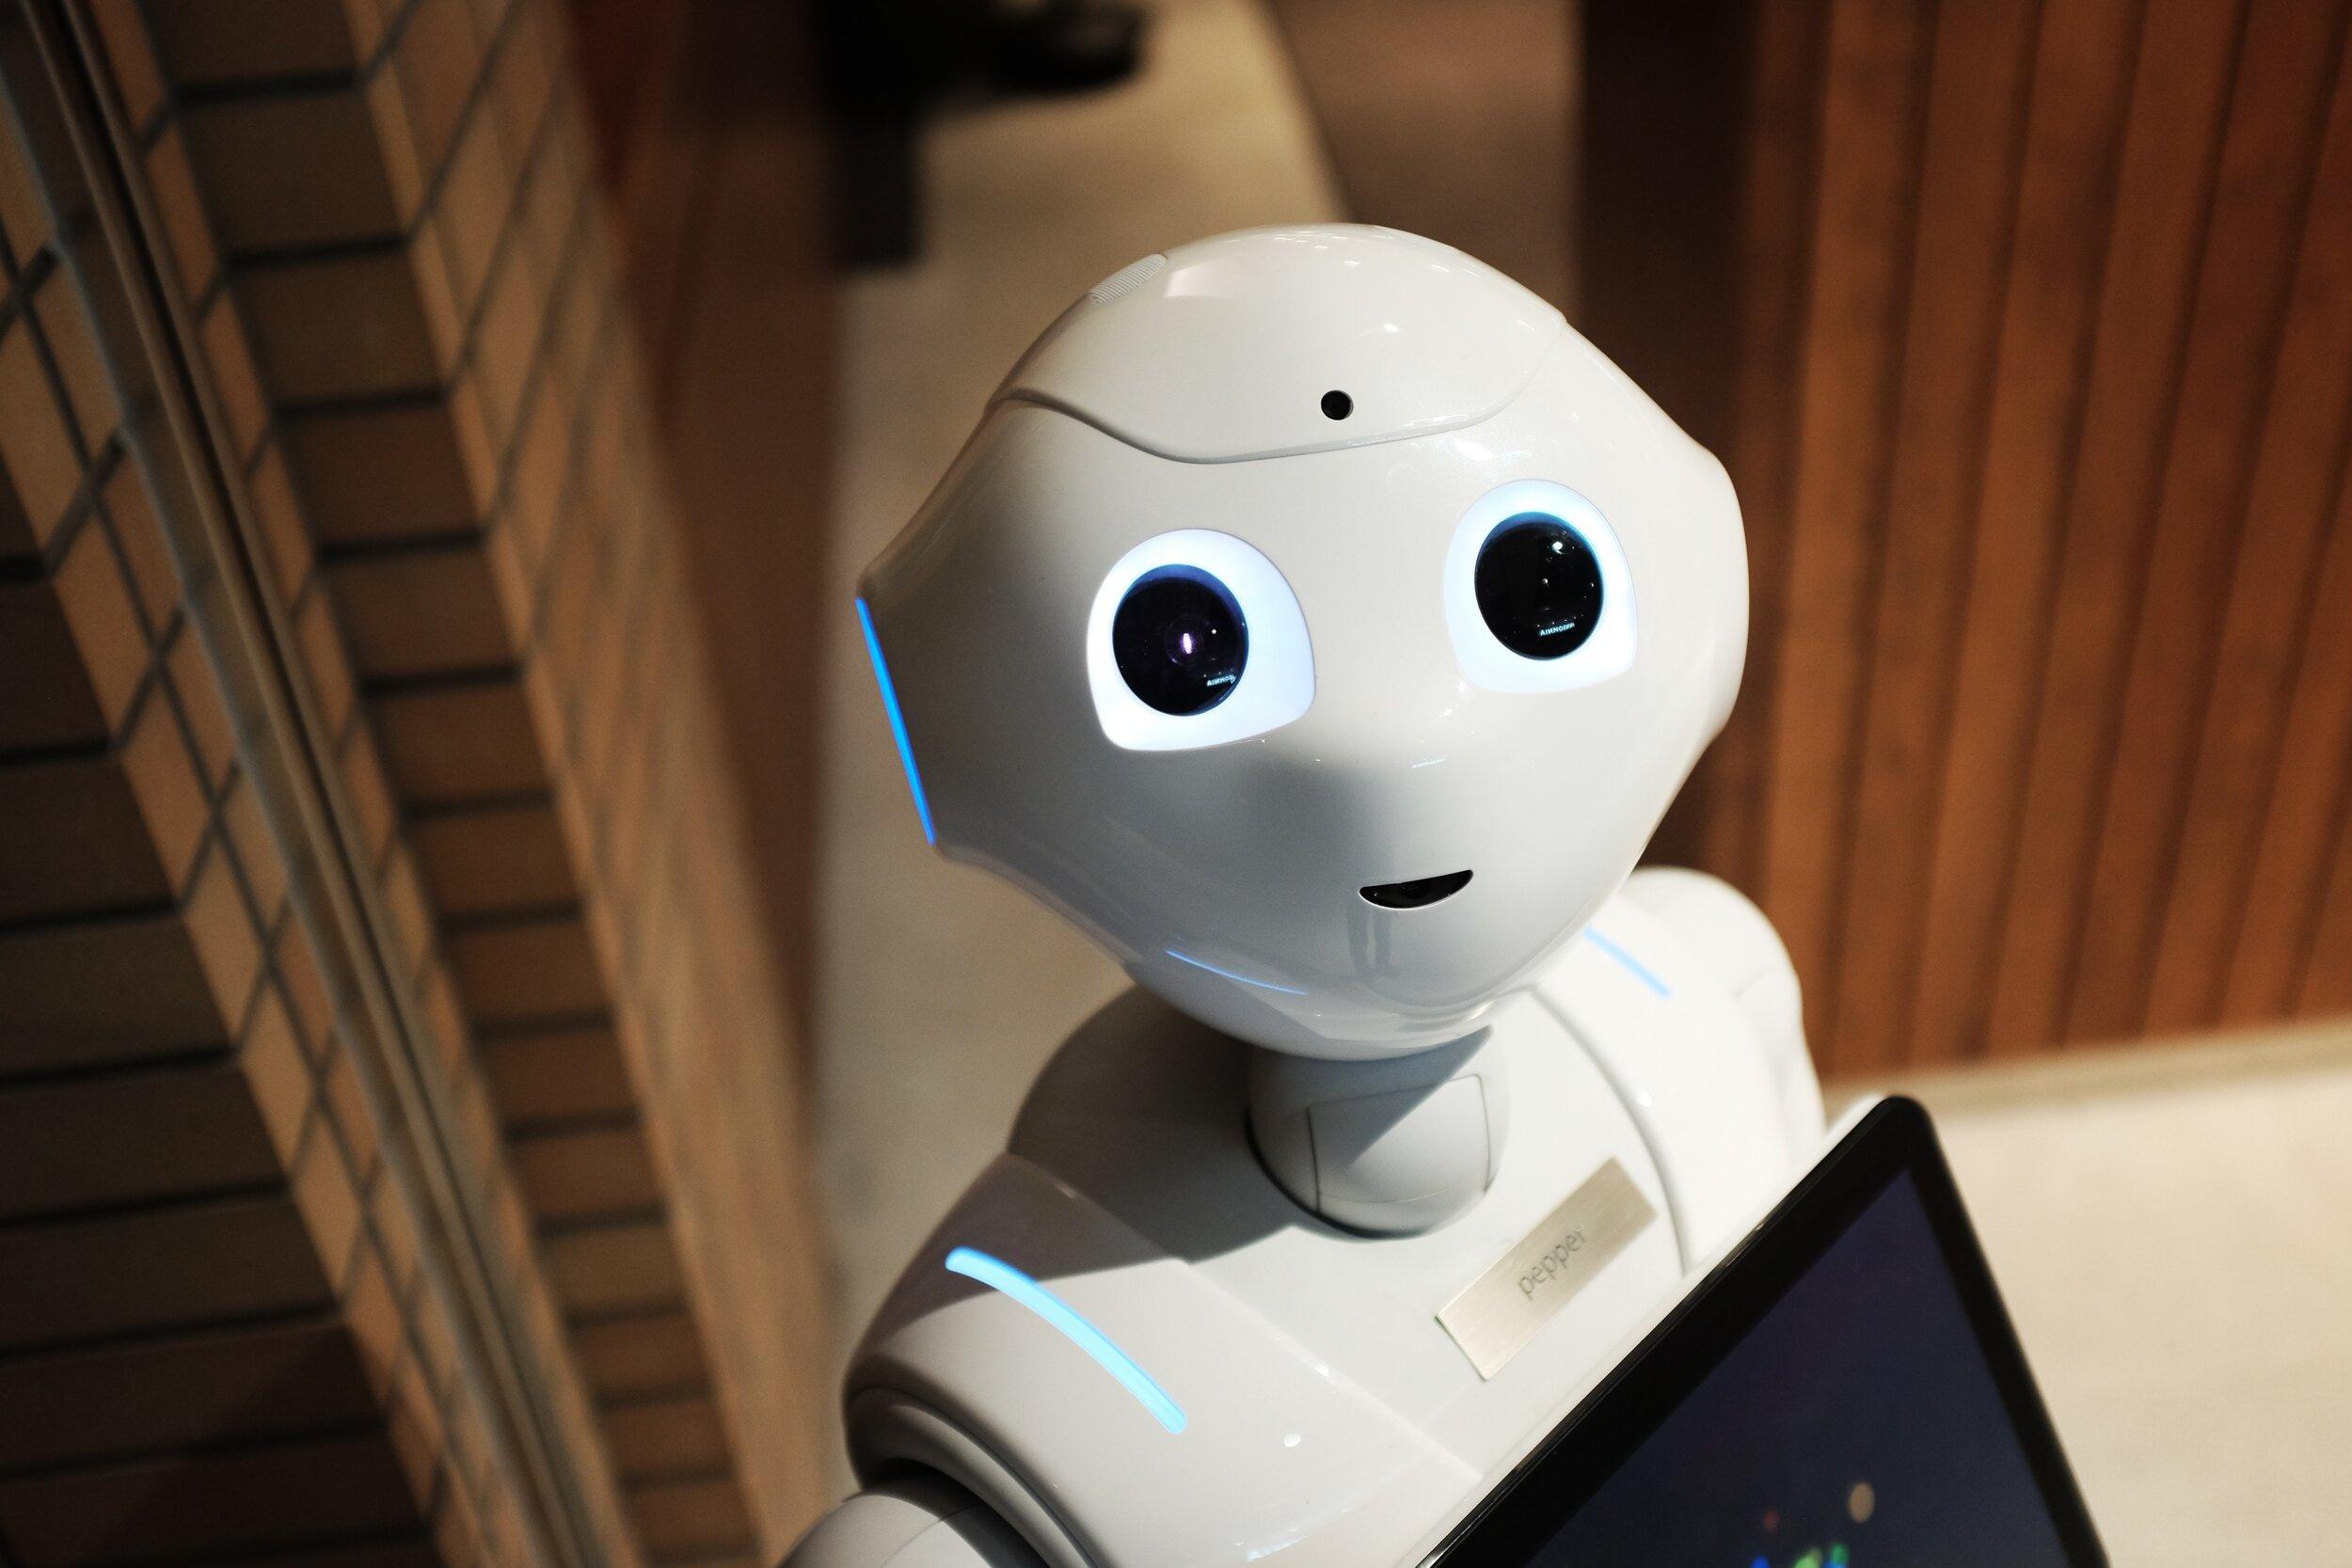 artificial-intelligence-electronics-future-2599244.jpg